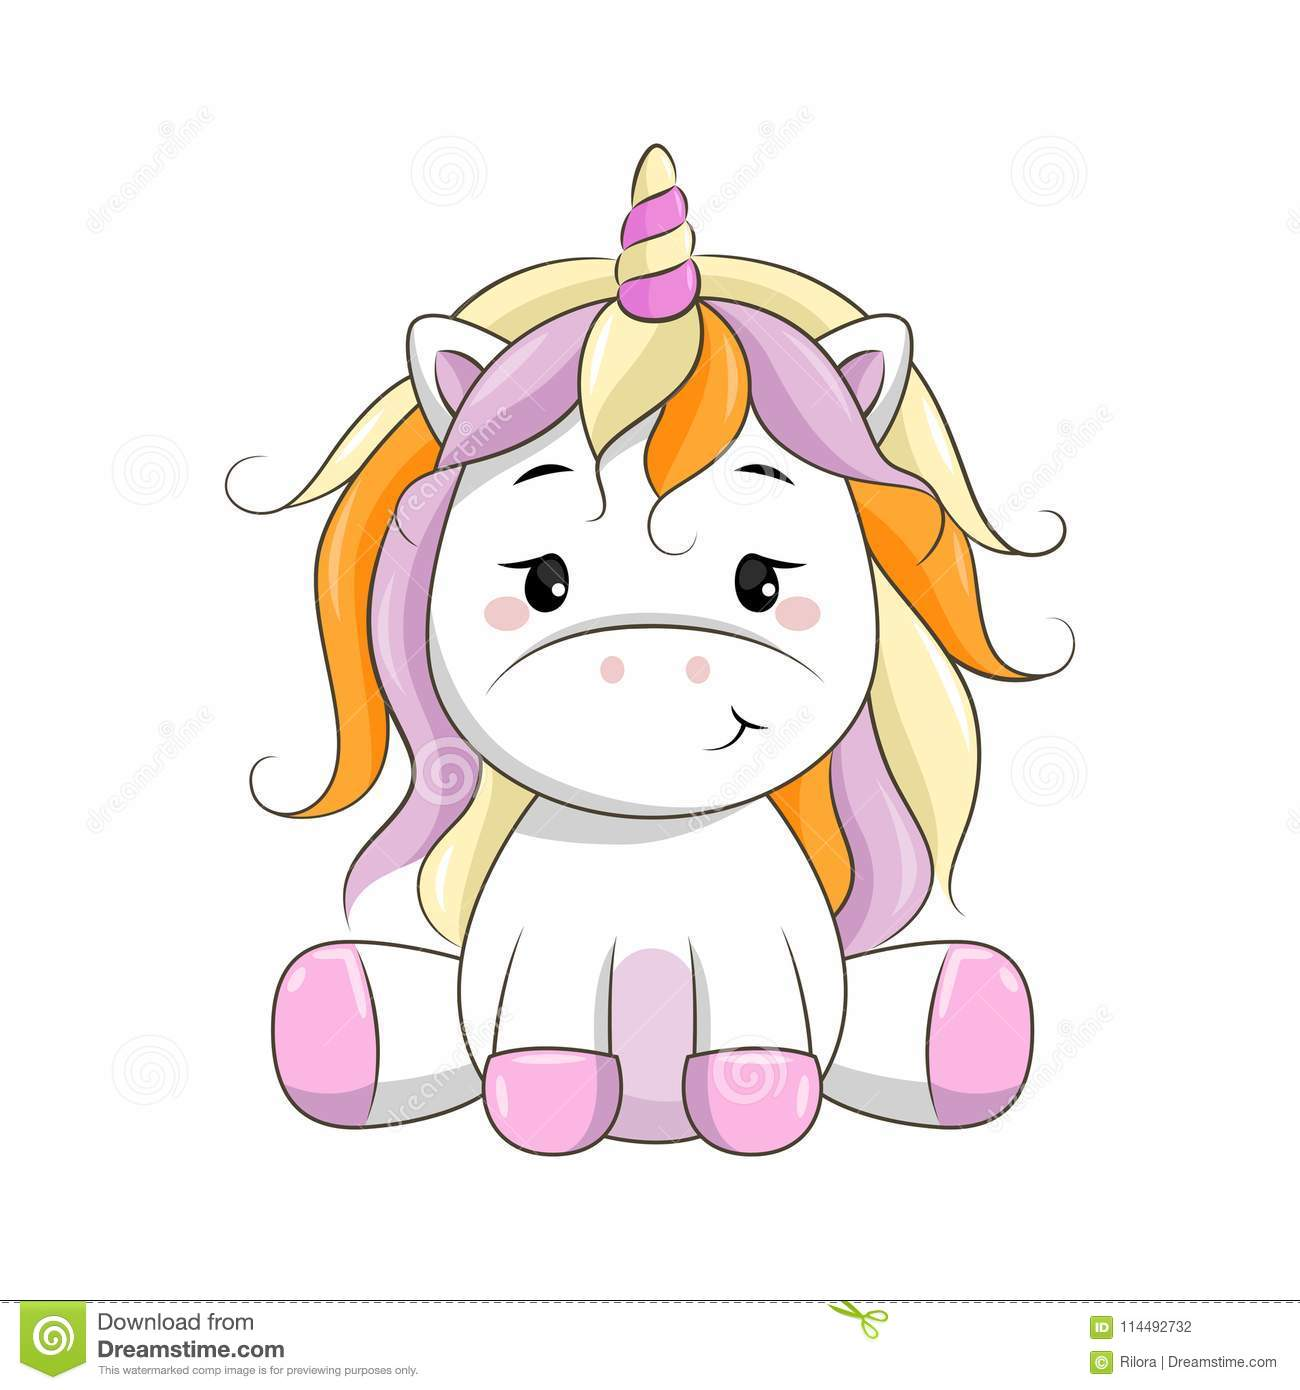 Cartoon unicorn clipart 2 » Clipart Station.